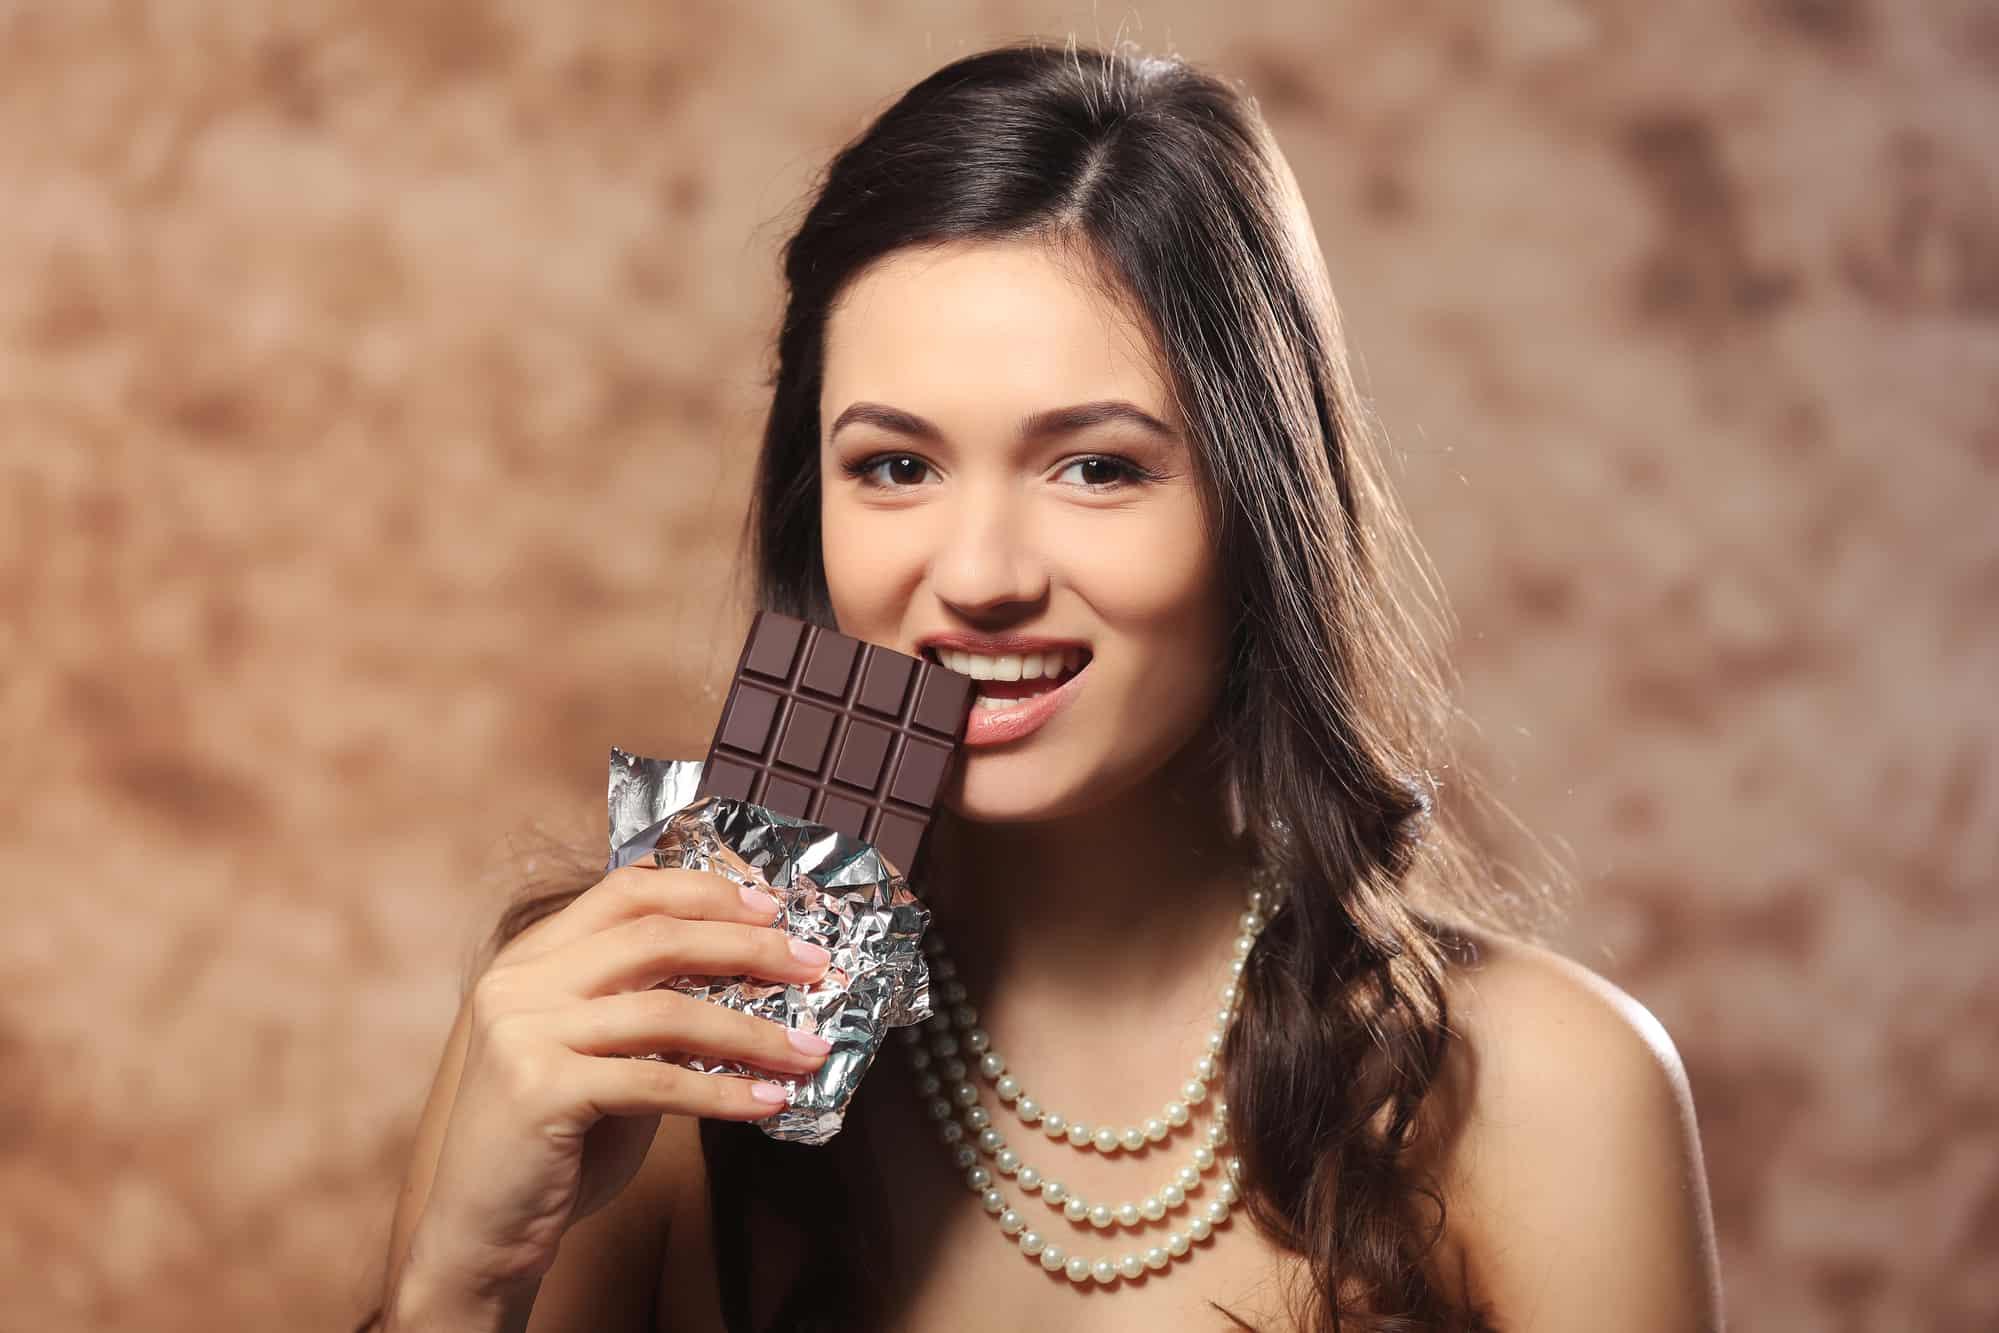 Best Proven Scientific Health Benefits Of Eating Dark Chocolate